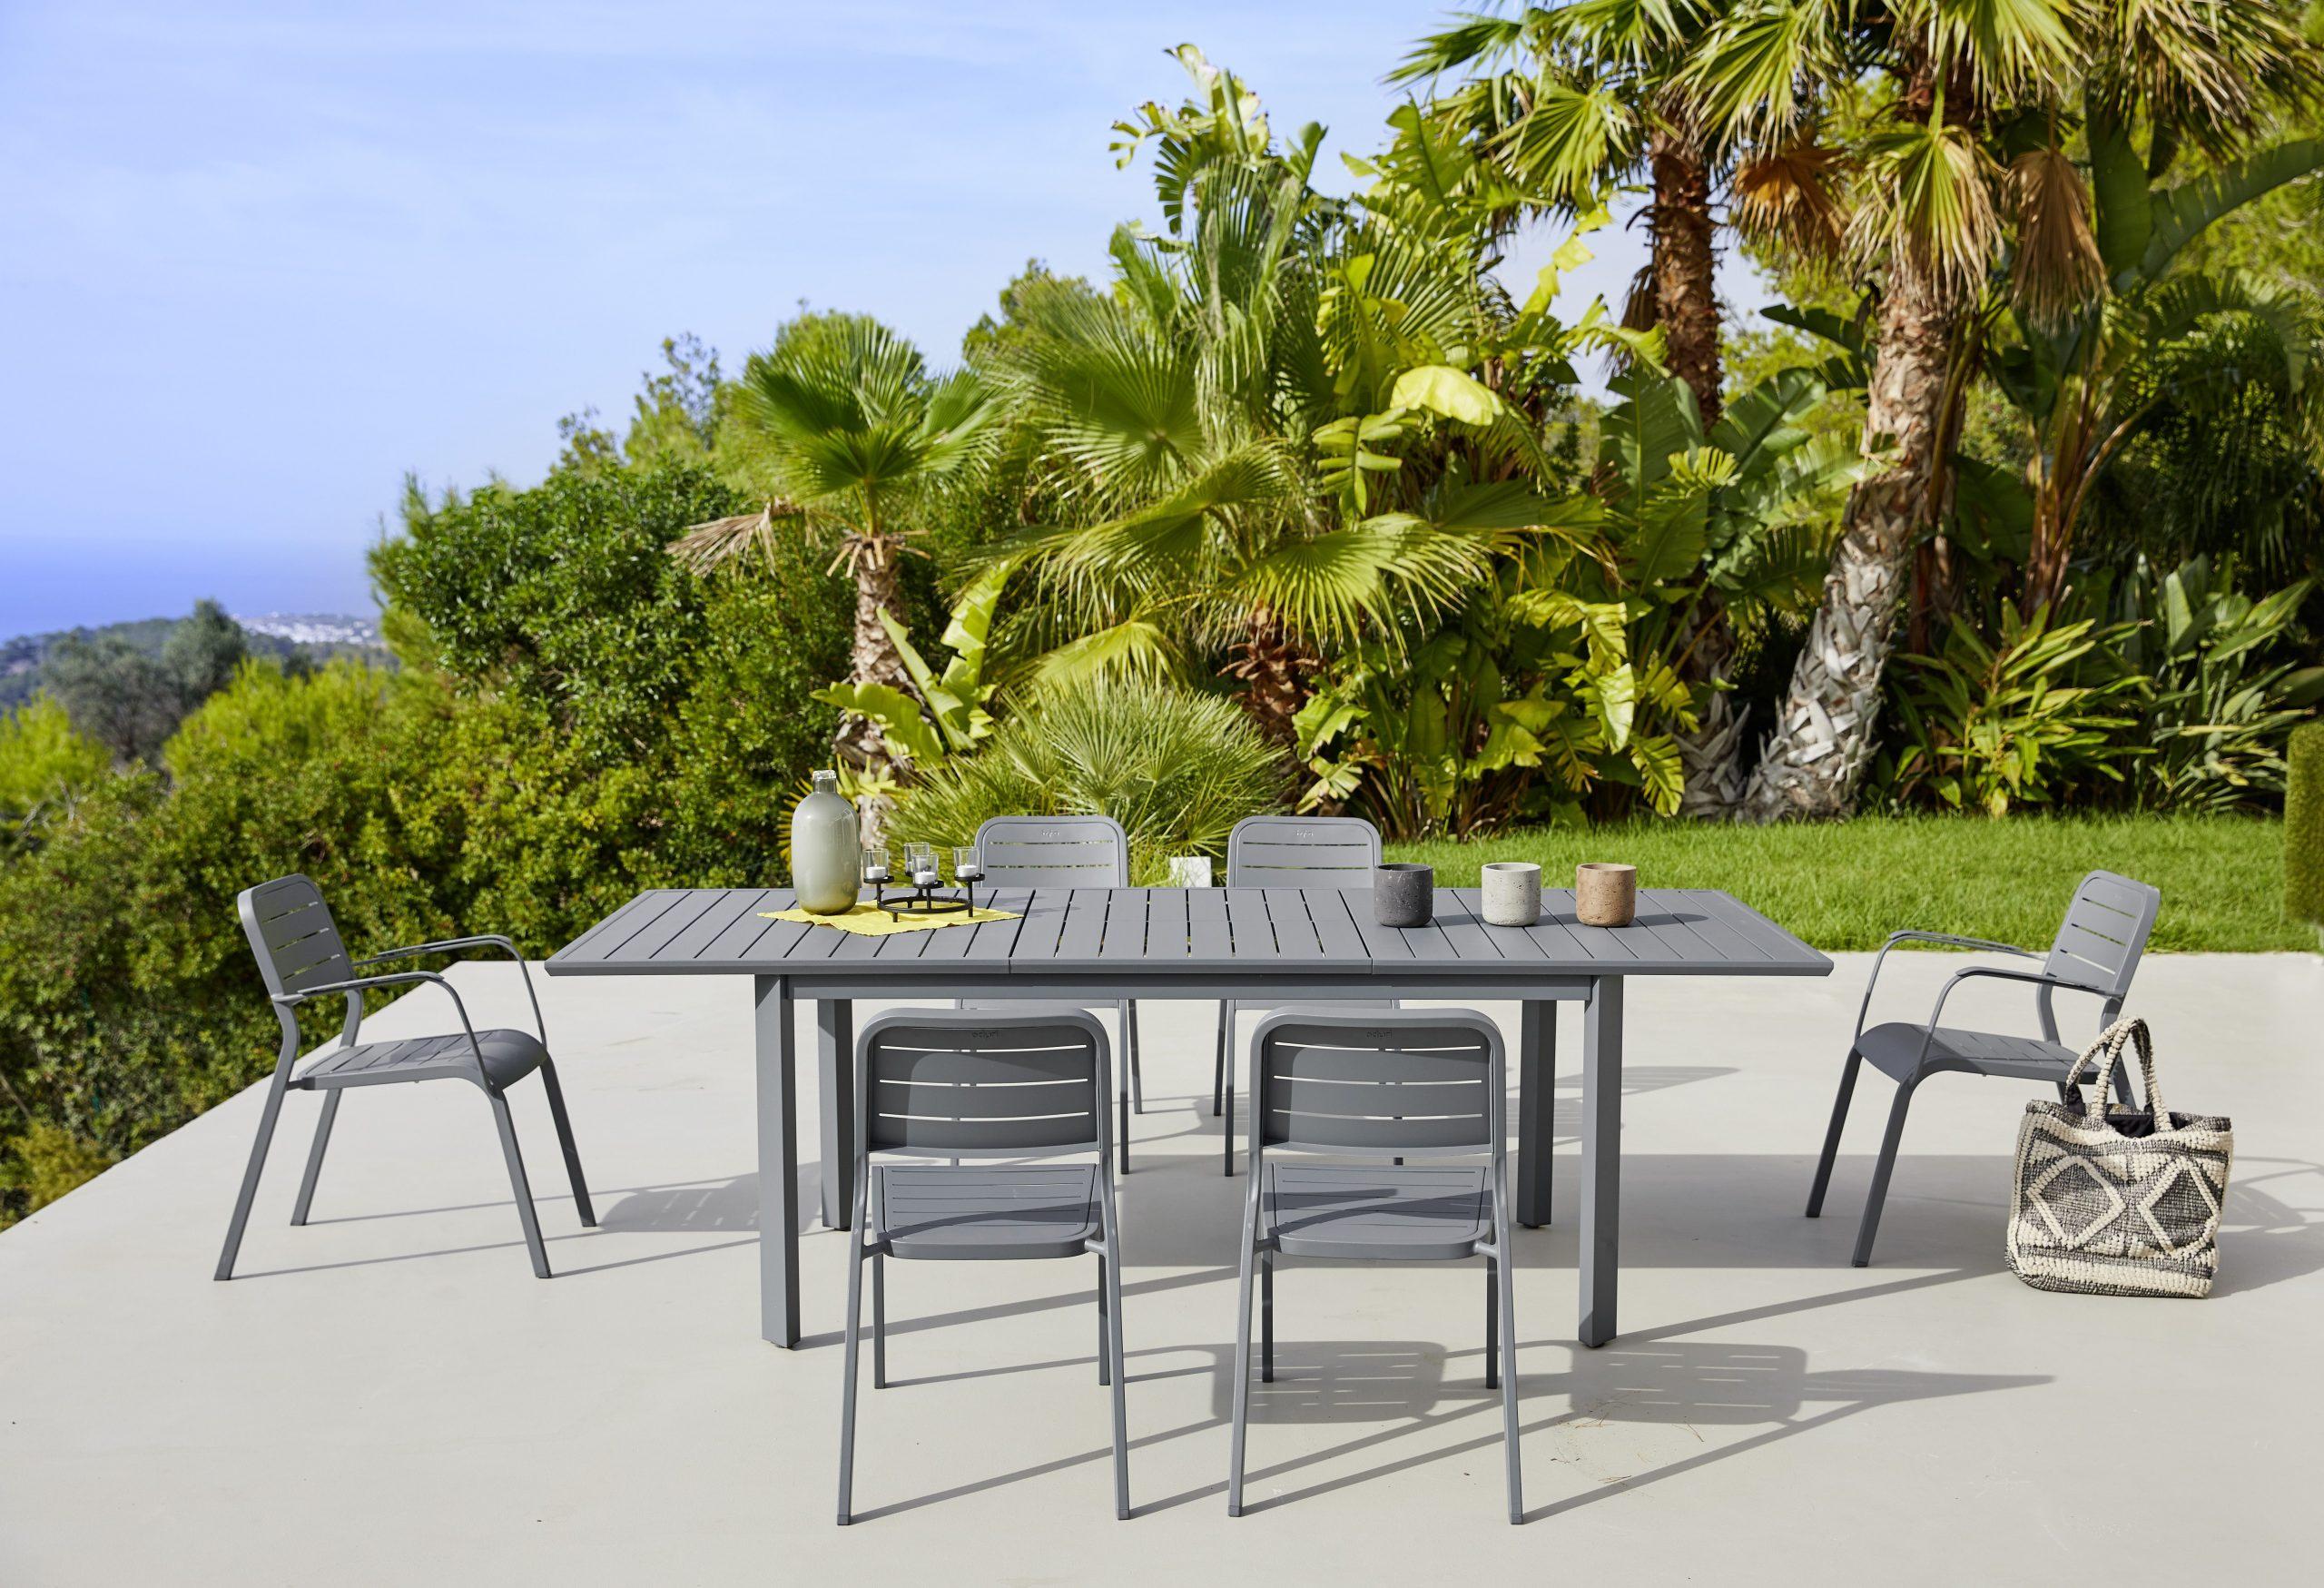 Evenements Jardin   Table De Jardin Alu, Mobilier Jardin Et ... dedans Chaise Longue De Jardin Carrefour